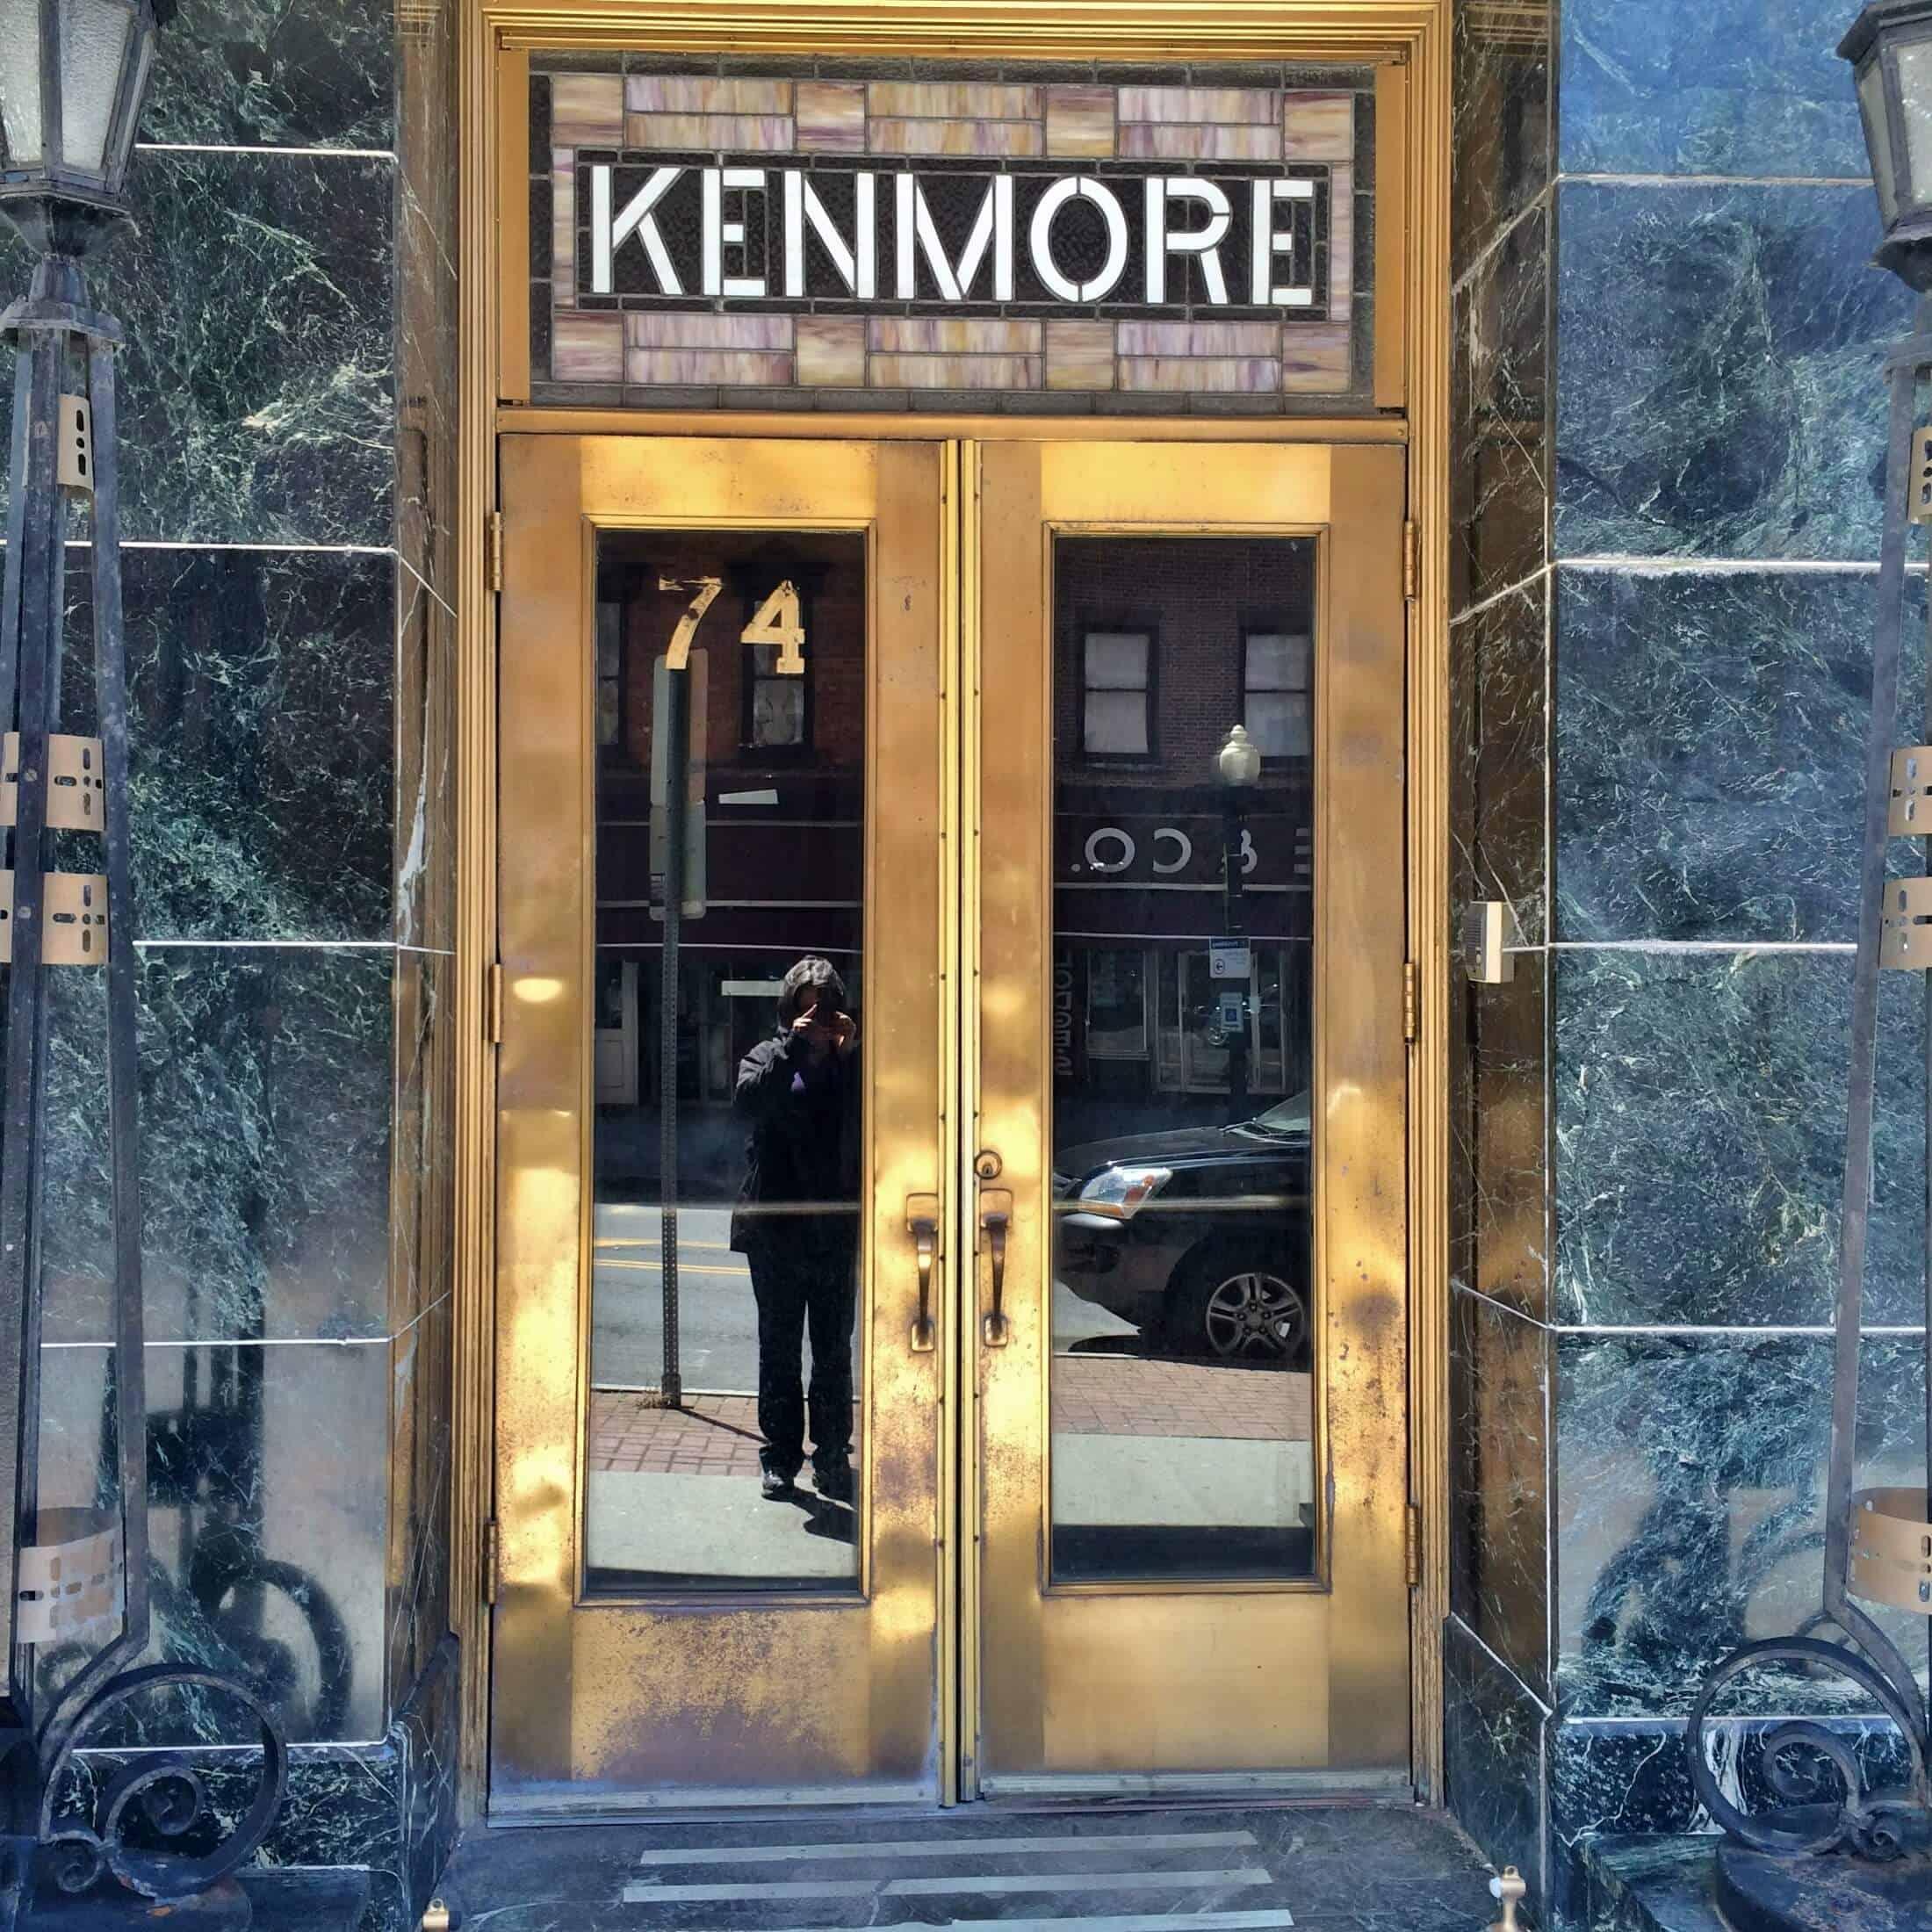 Kenmore doorway in albany ny